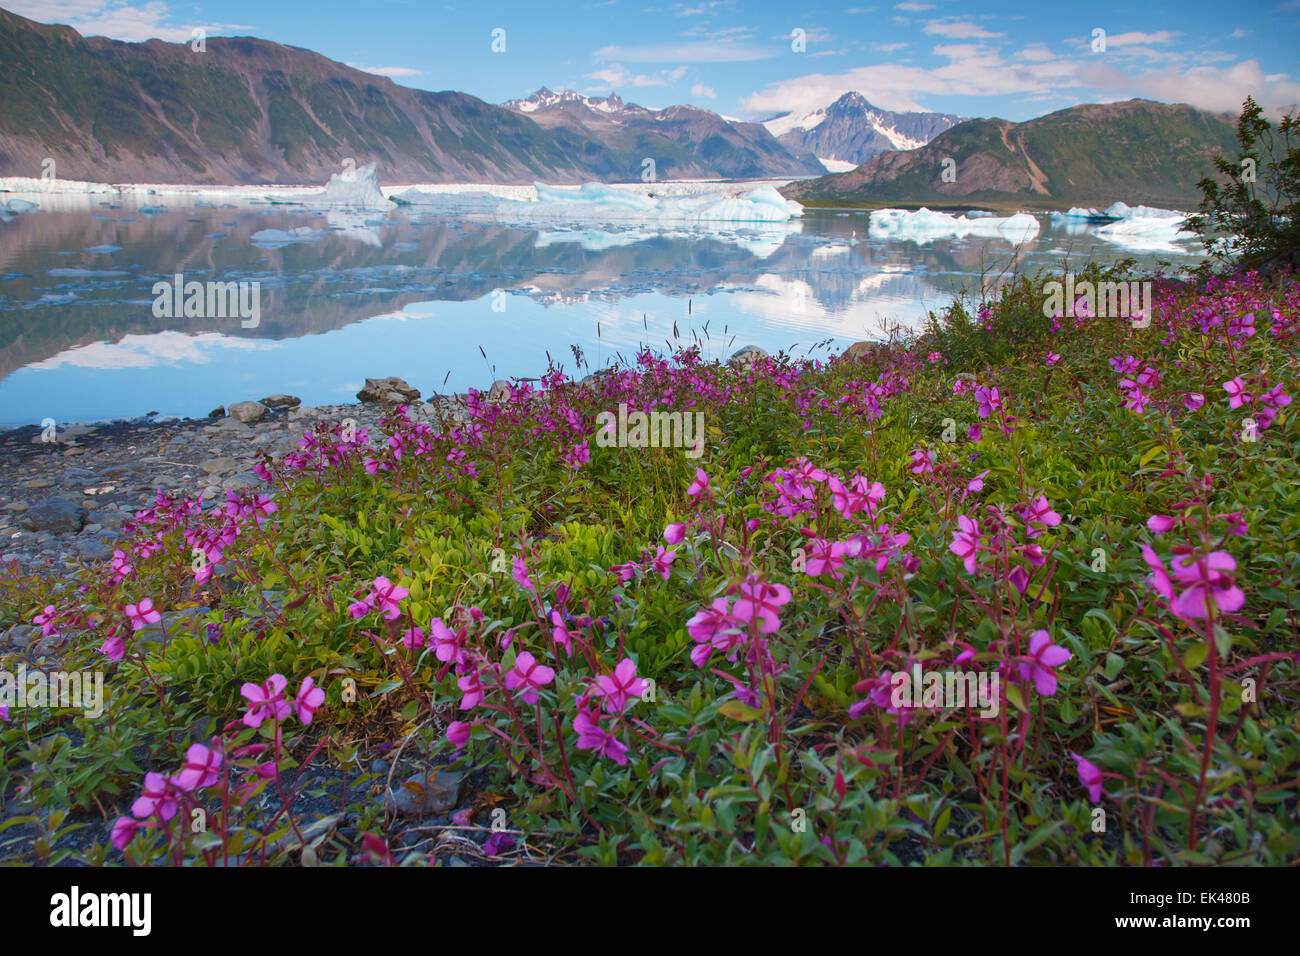 Bear Glacier Lagoon, Kenai Fjords National Park, near Seward, Alaska. - Stock Image